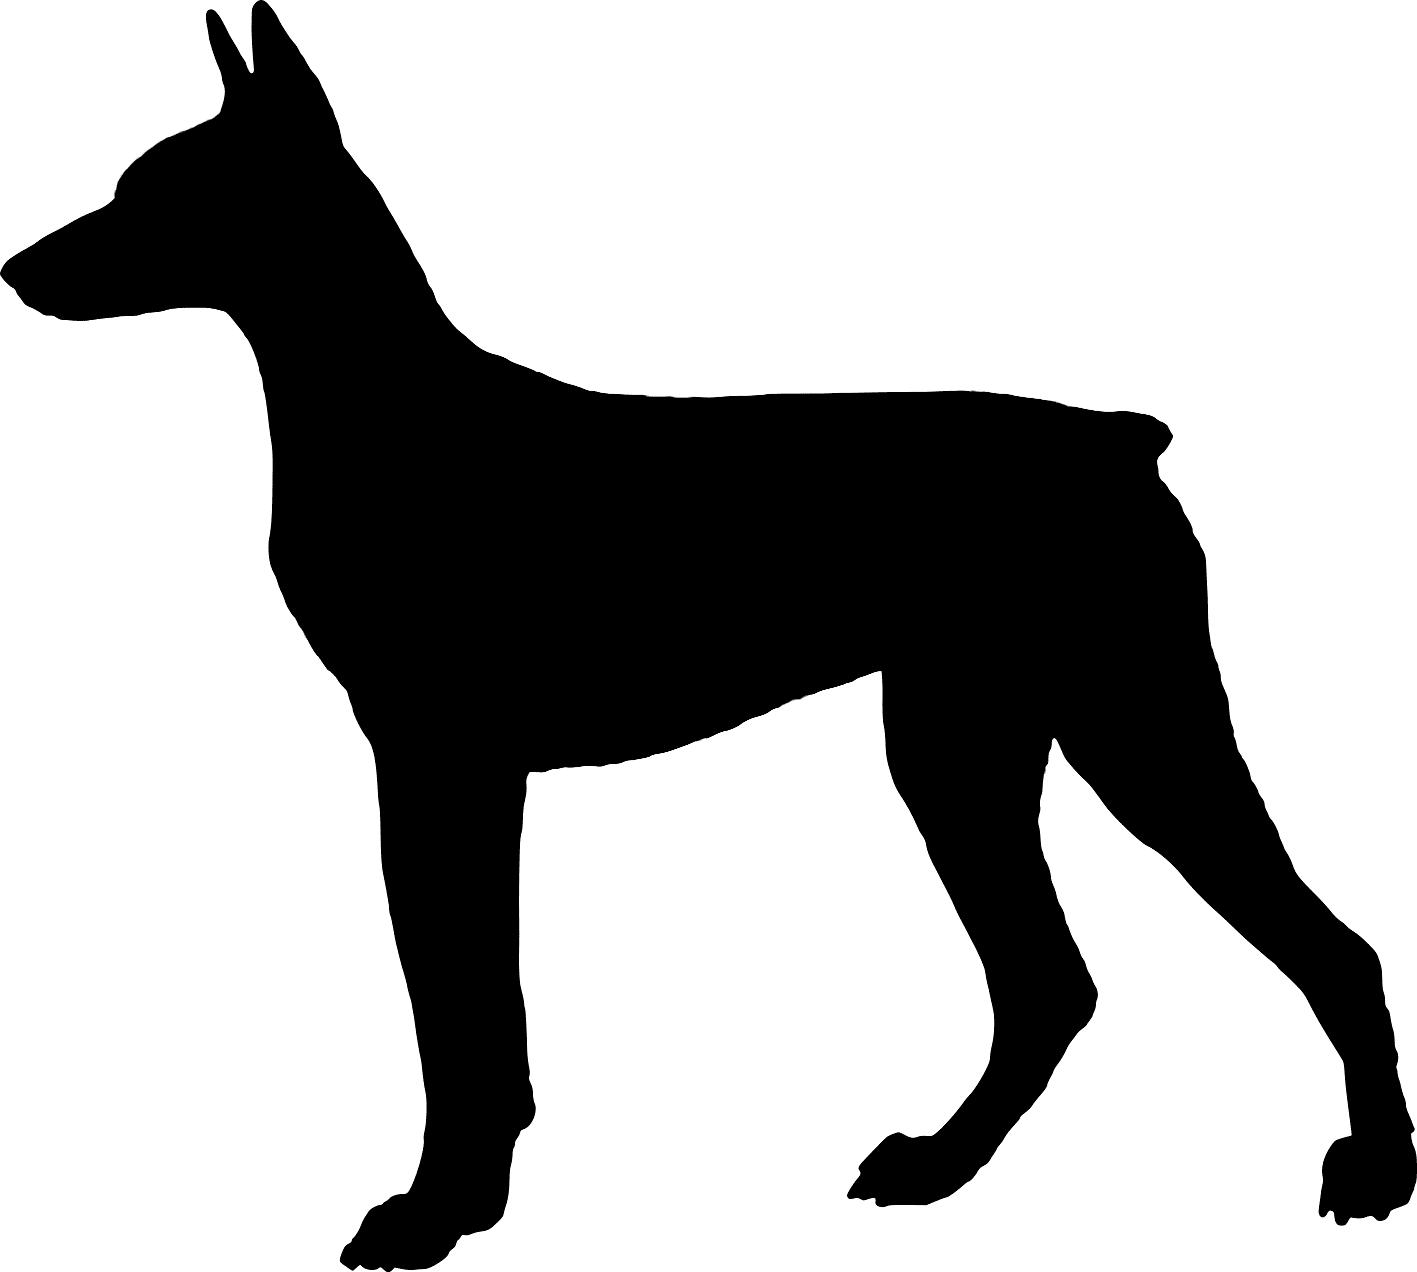 Dog Head Of Femur Removed Can Dog Still Walk